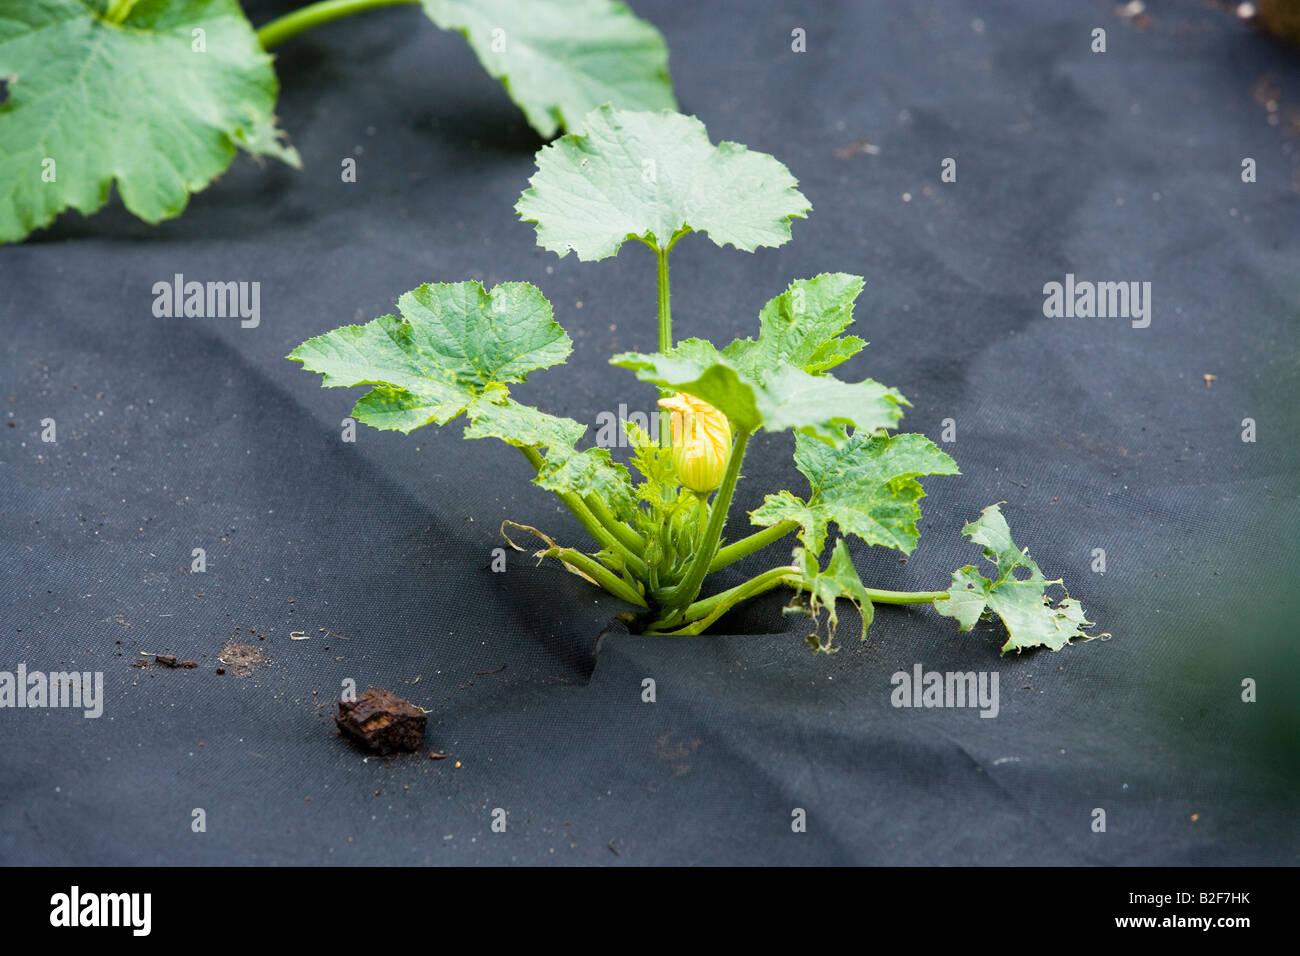 marrow grown through plastic sheeting in a vegetable garden - Stock Image